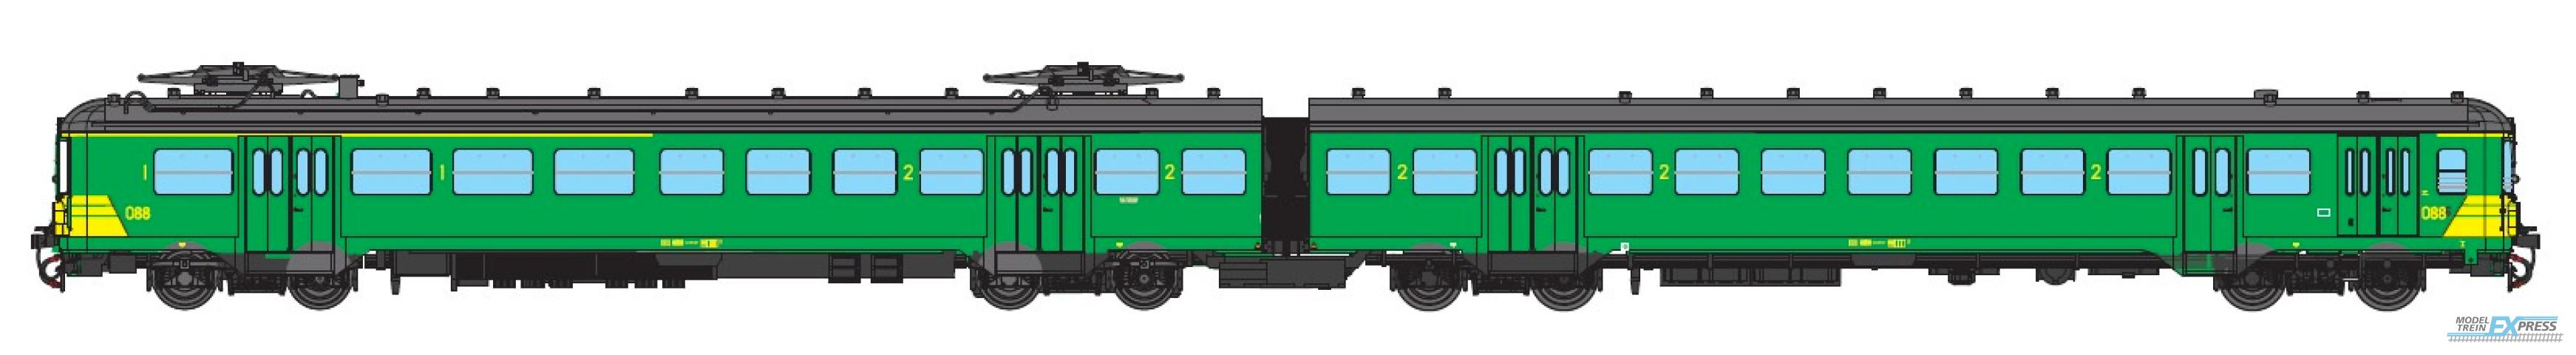 B-Models 7003.04L